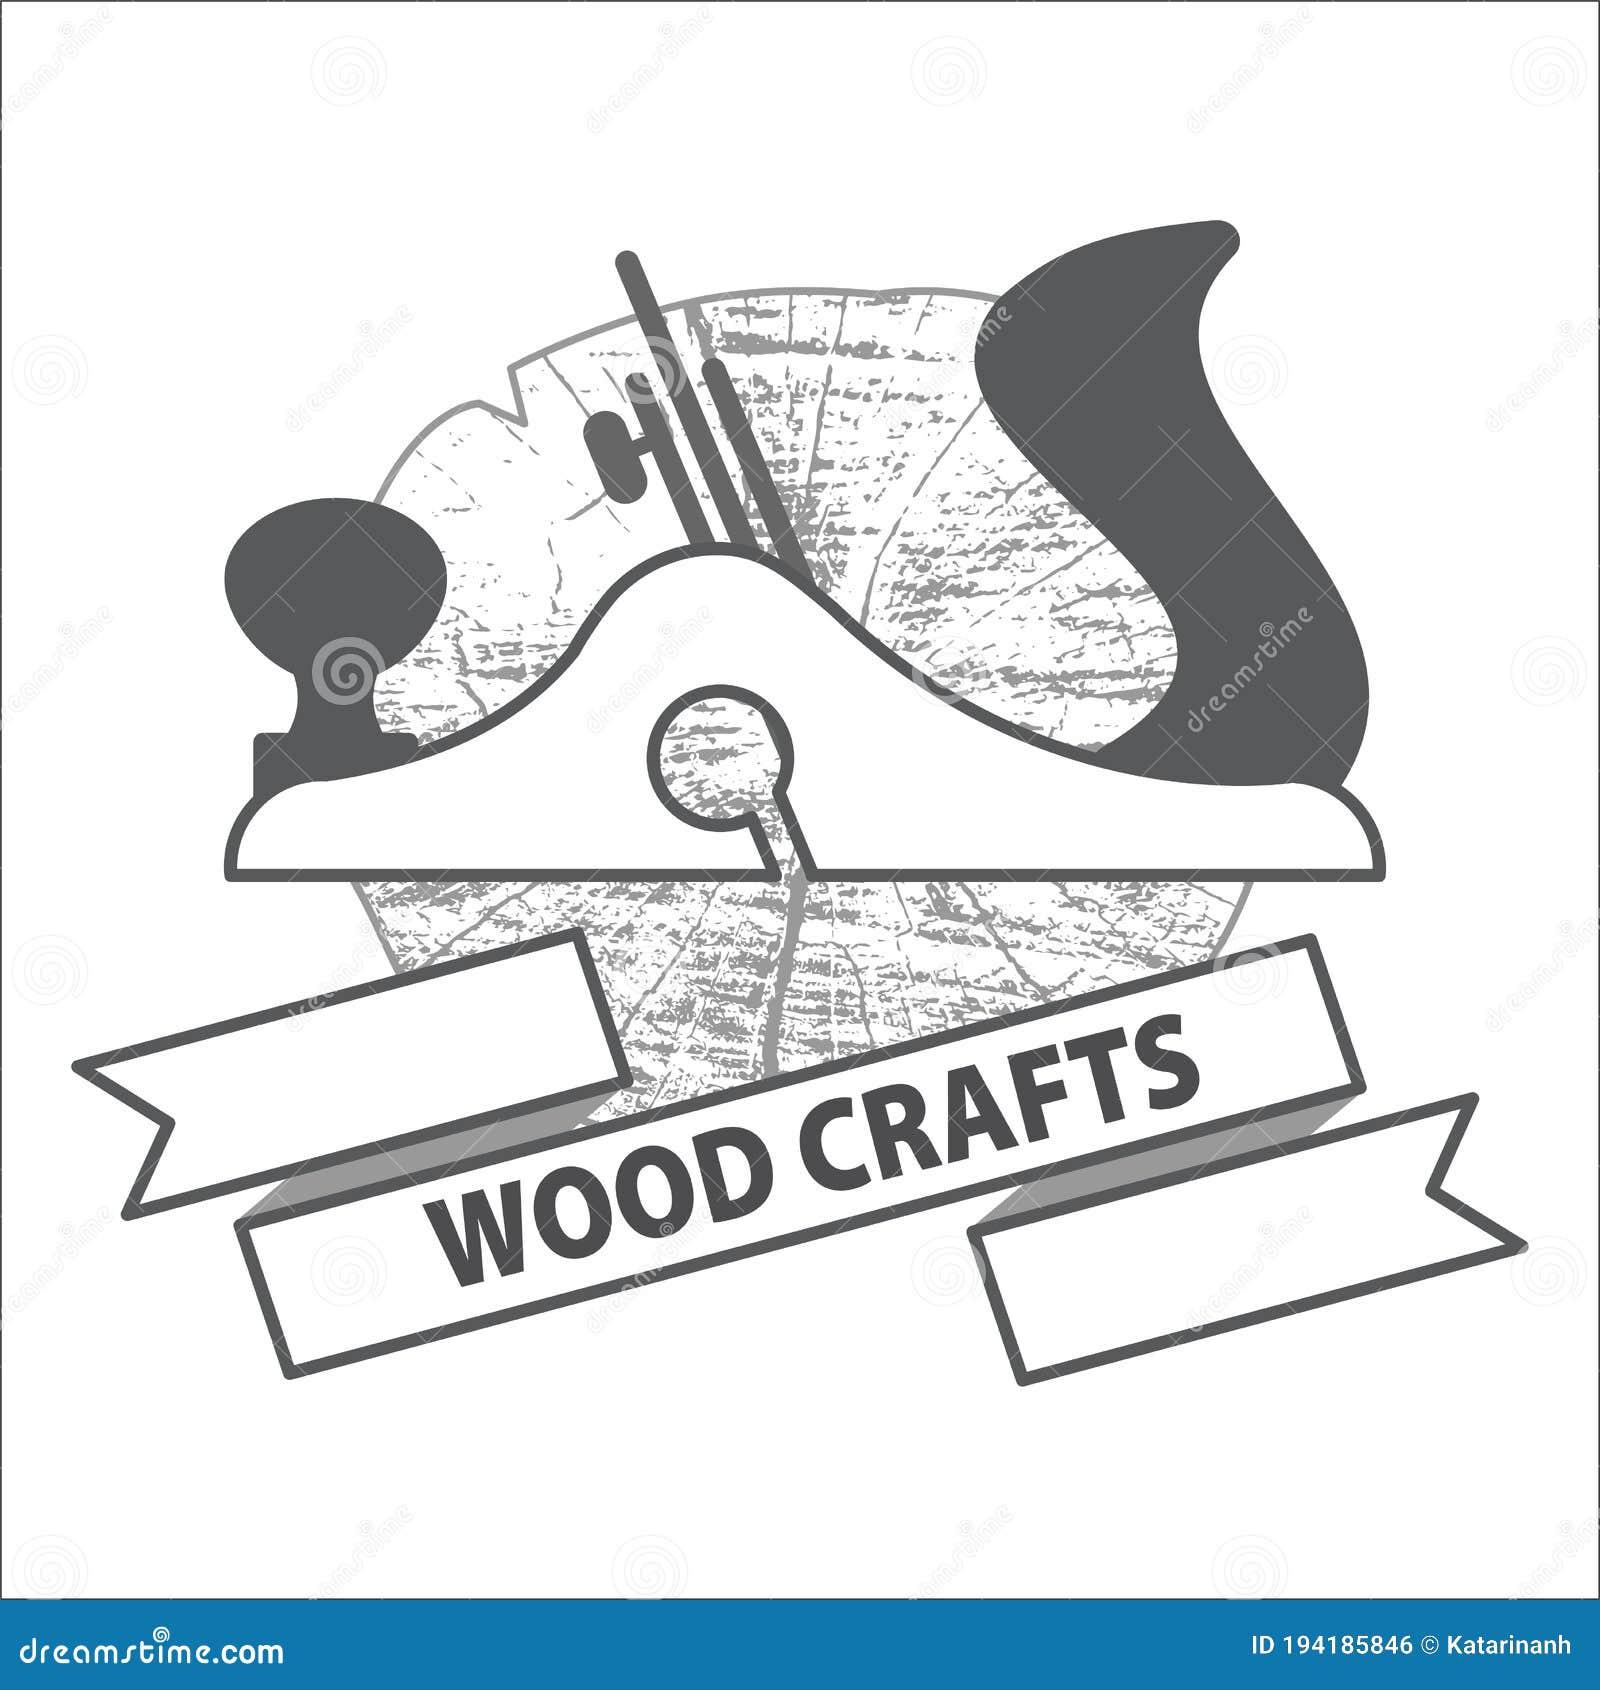 Plane Tree Logo Stock Illustrations 1 872 Plane Tree Logo Stock Illustrations Vectors Clipart Dreamstime